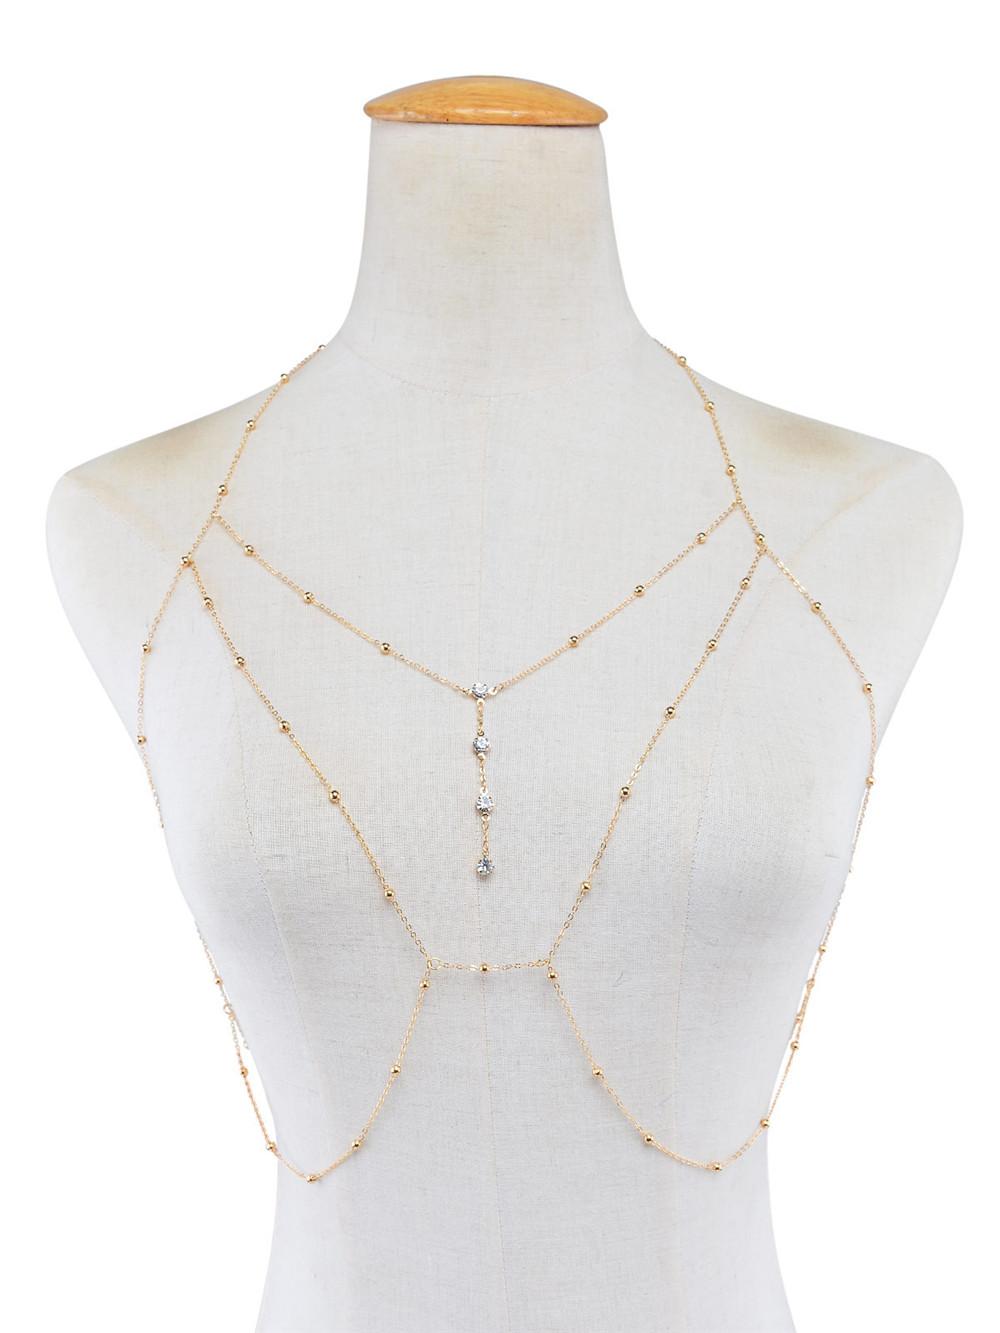 GIVVLLRY Rhinestones Tassel Body Chain Sexy Beach Gold Silver Color Wedding Accessories Bra Cross Body Chain Jewellery for Women 5